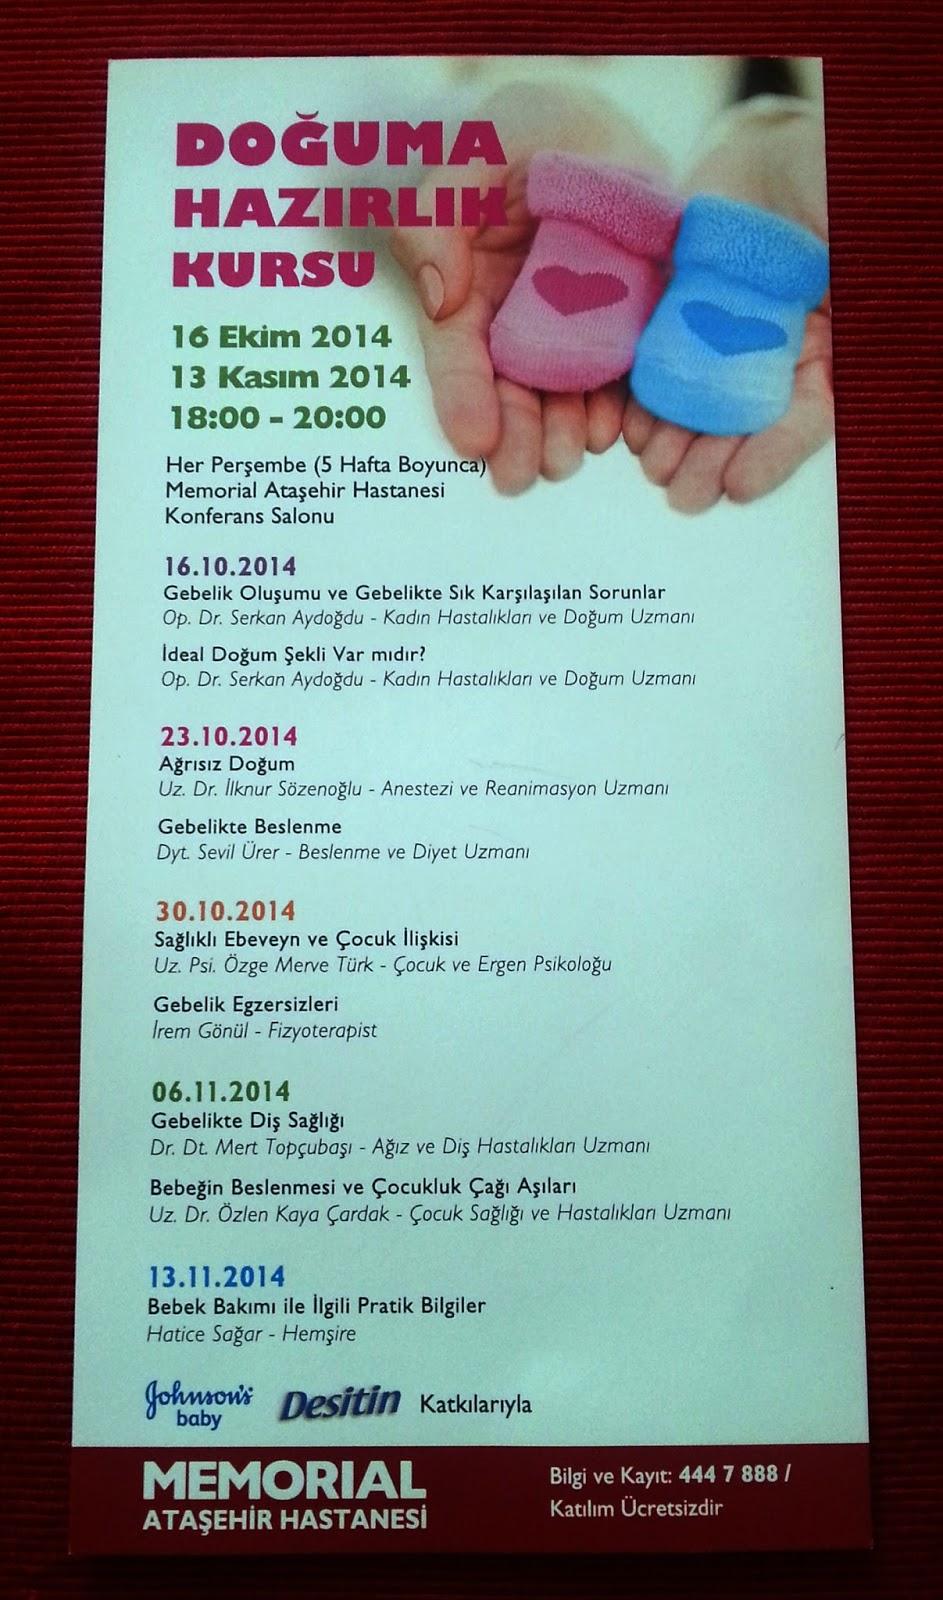 ücretsiz doğuma hazırlık kursu